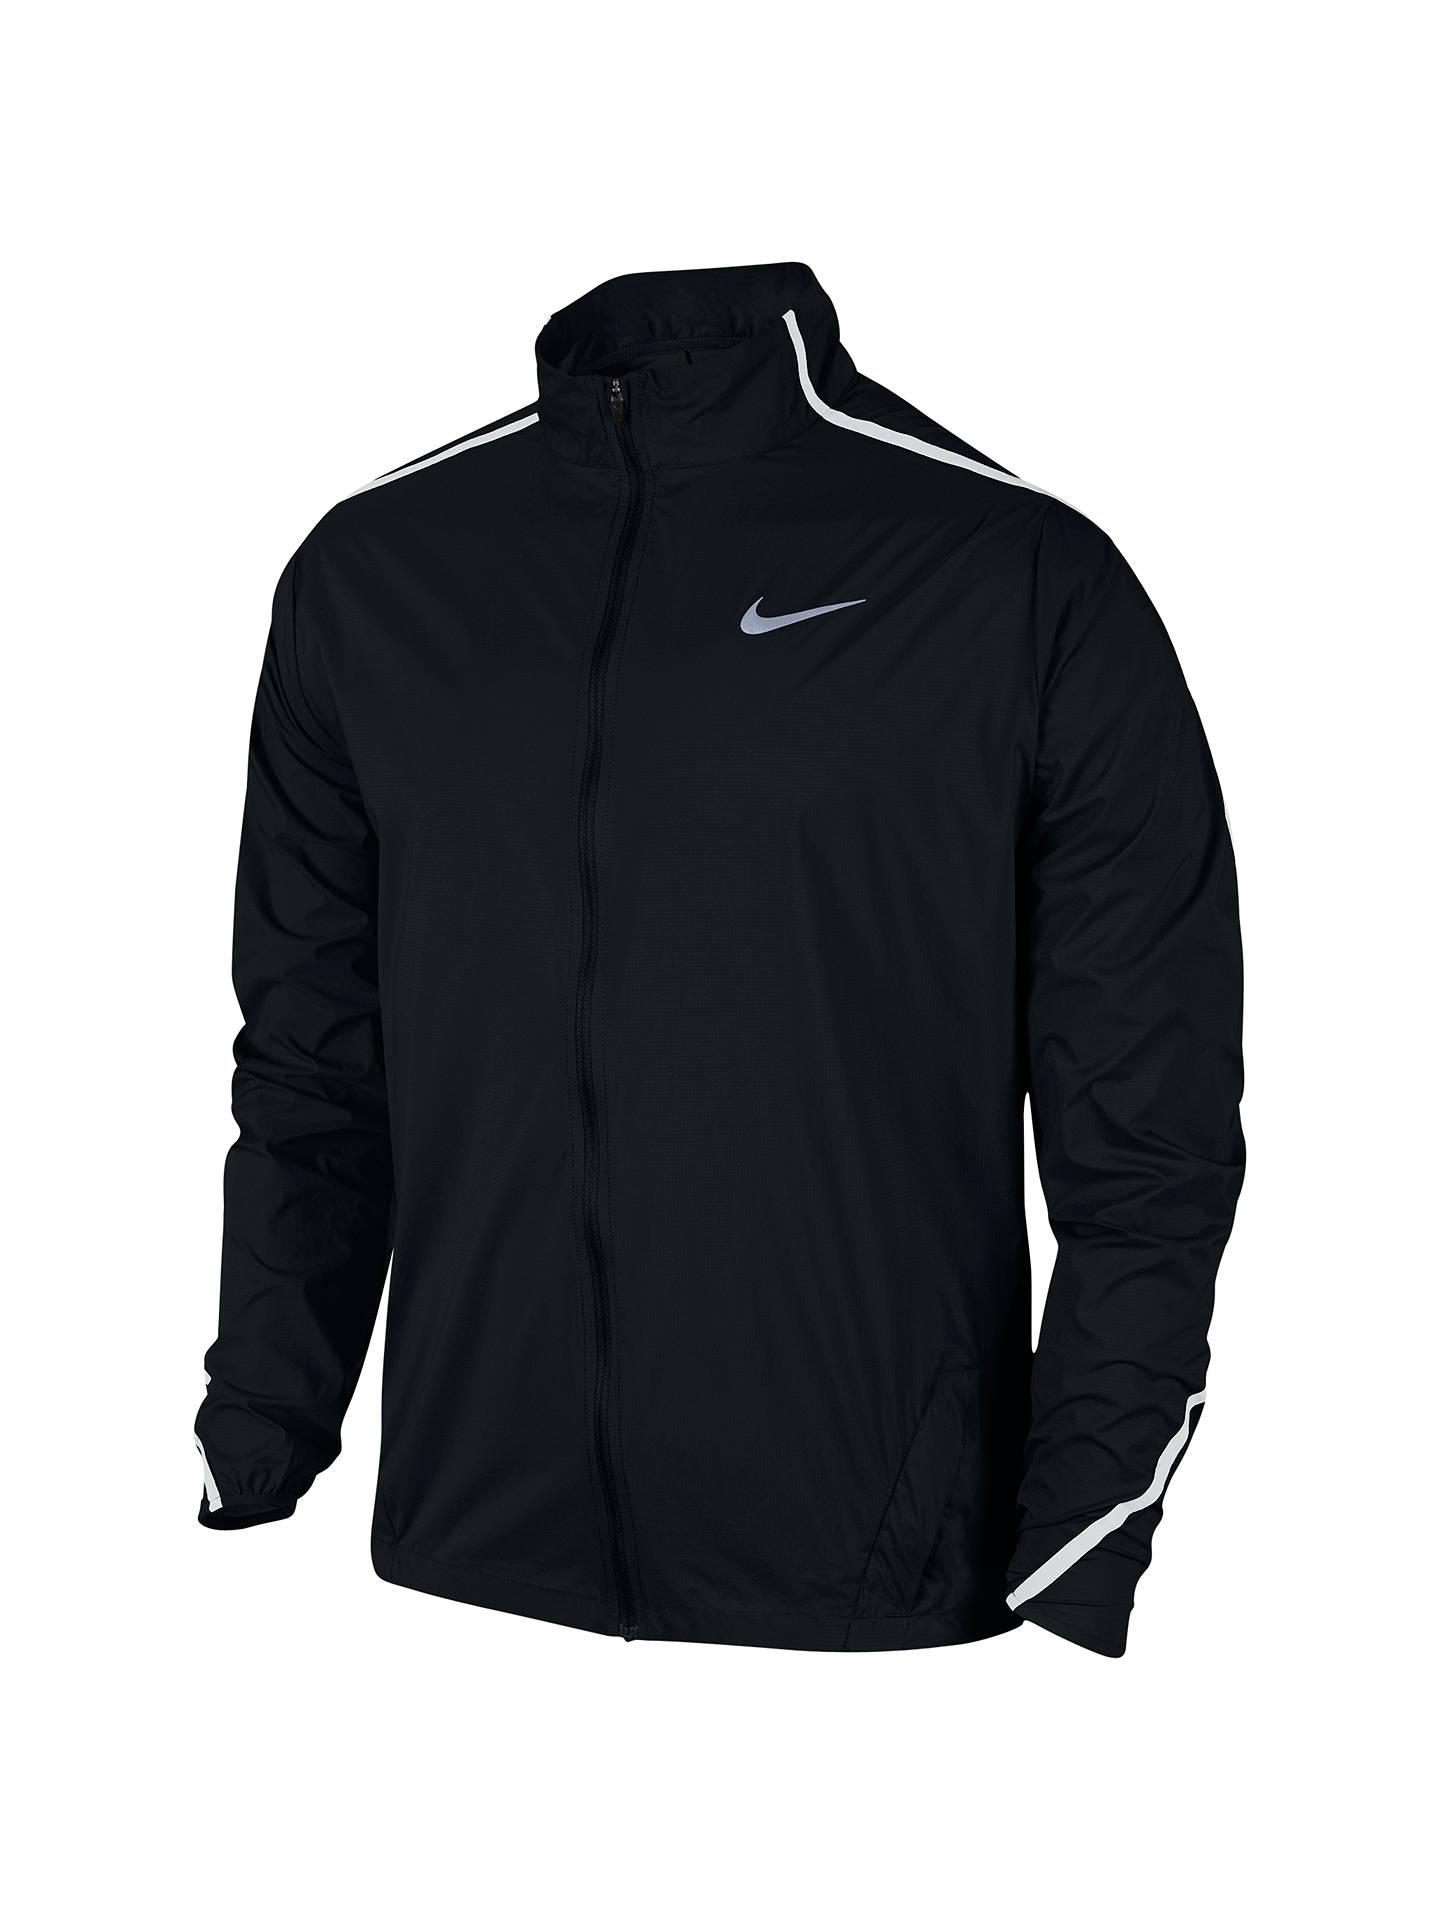 34b7ee1e14aa Buy Nike Shield Impossibly Light Running Jacket